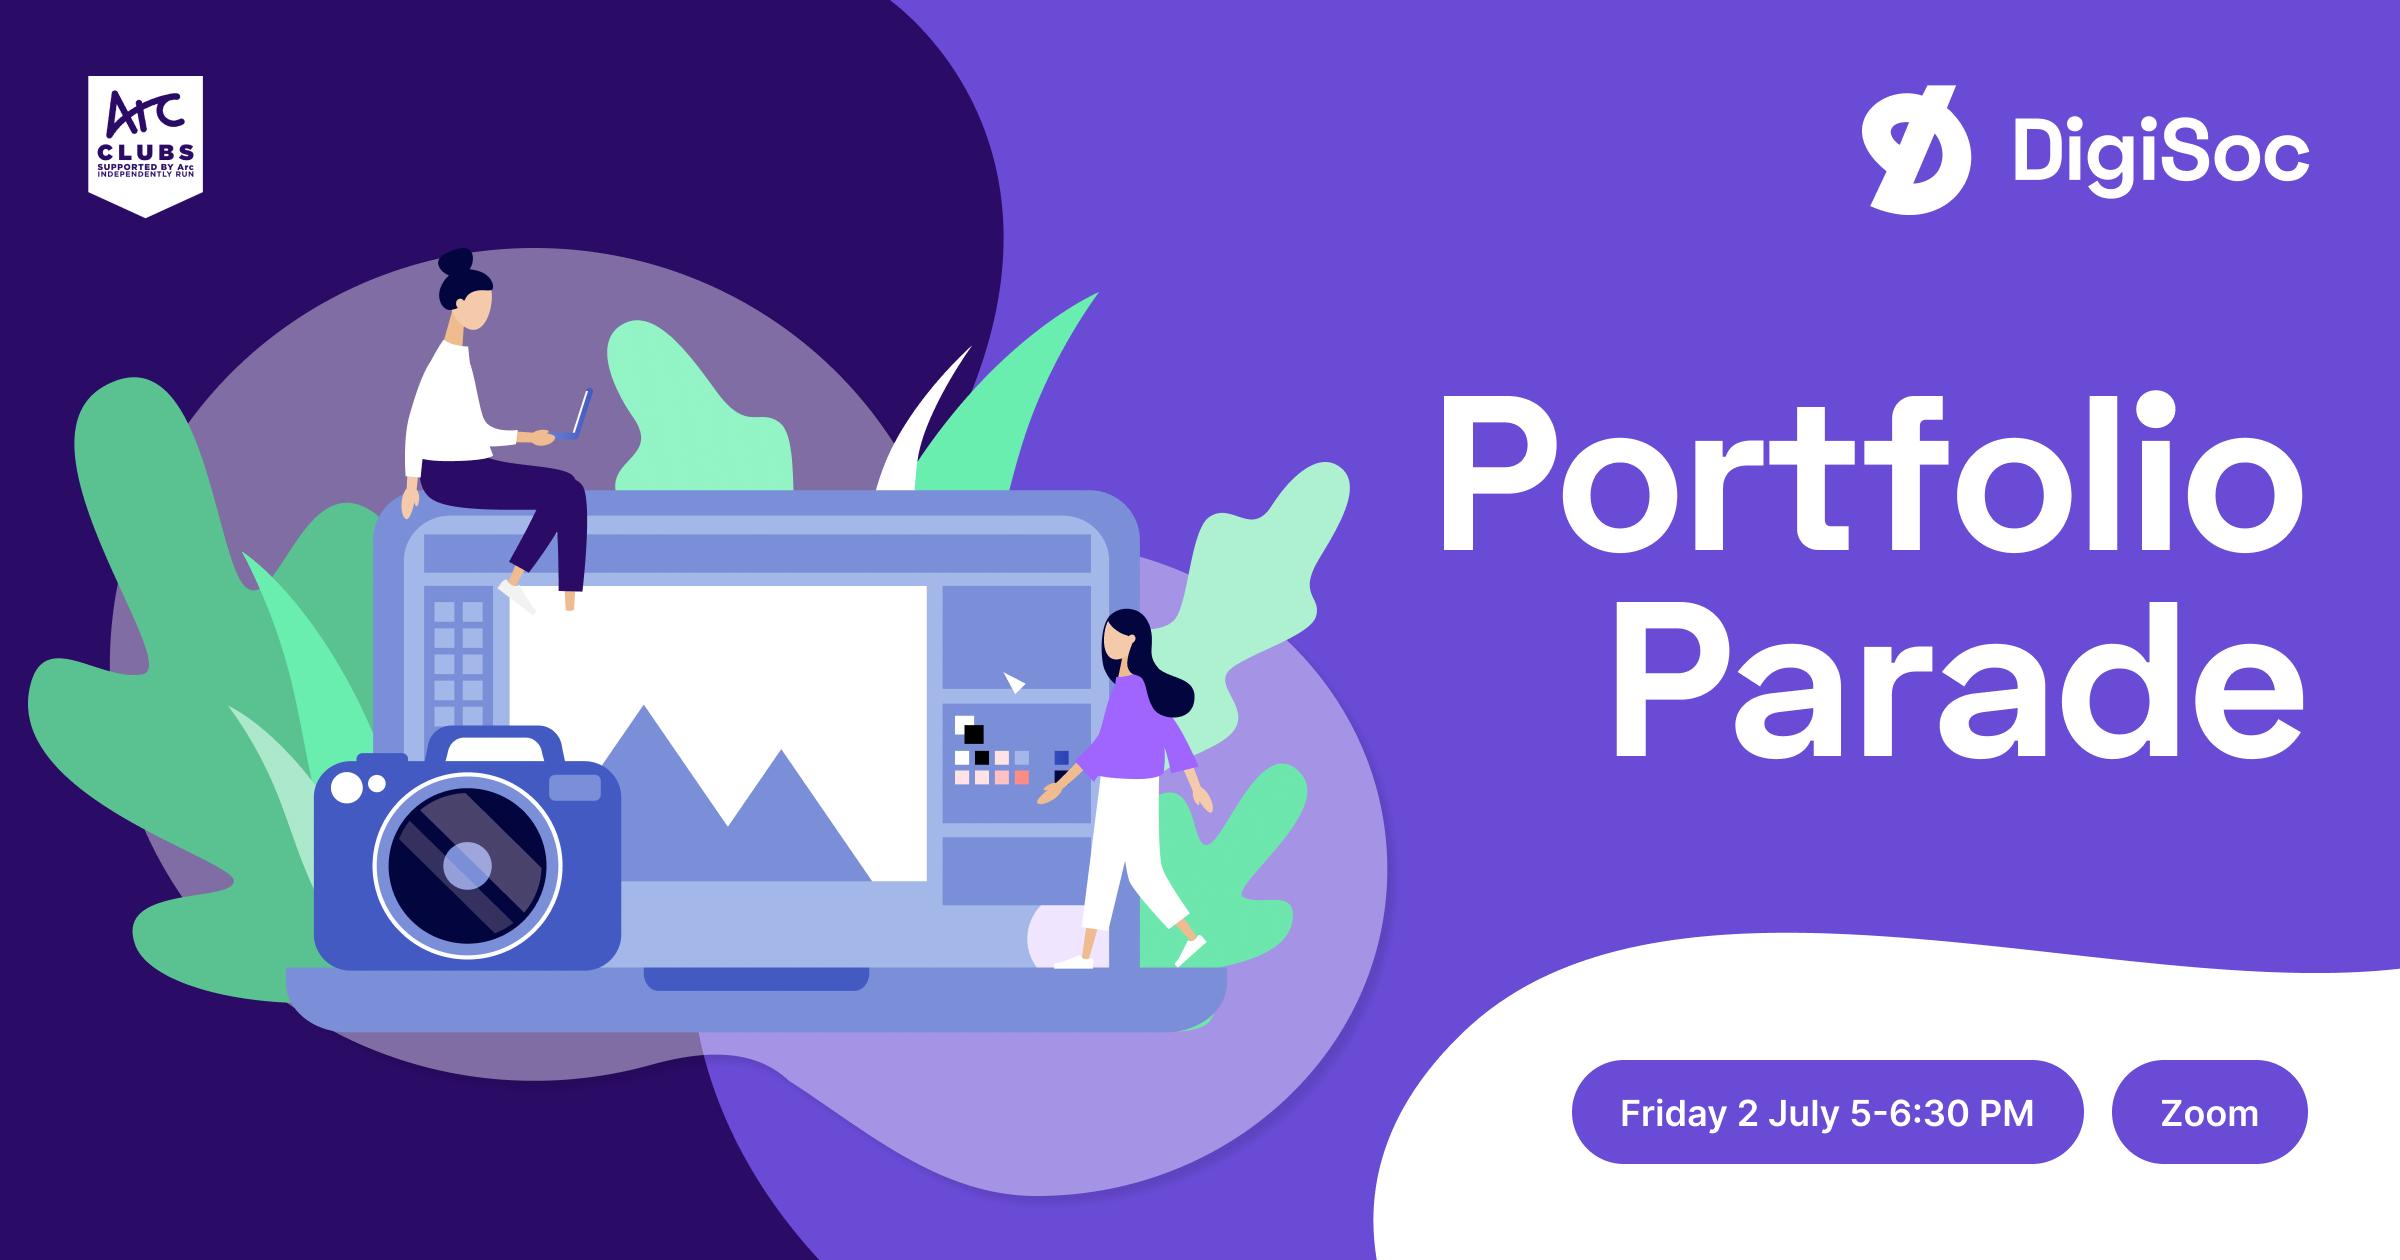 DigiSoc Presents: Portfolio Parade